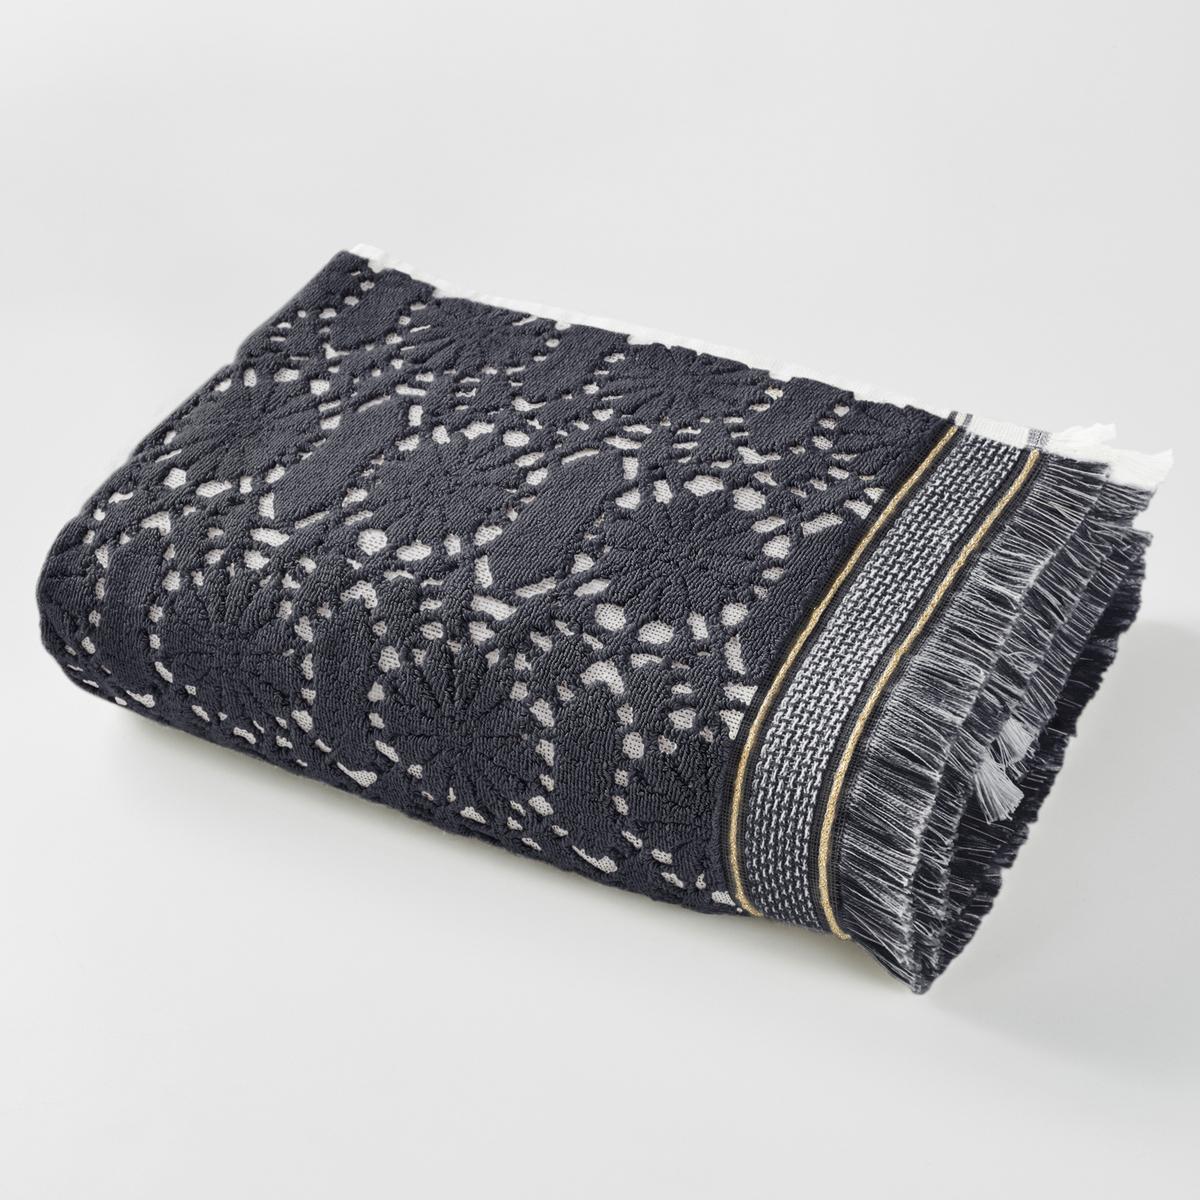 Полотенце банное макси махровое 500г/м² PURDY полотенца банные aisha махровое полотенце бежевый 40 70 100